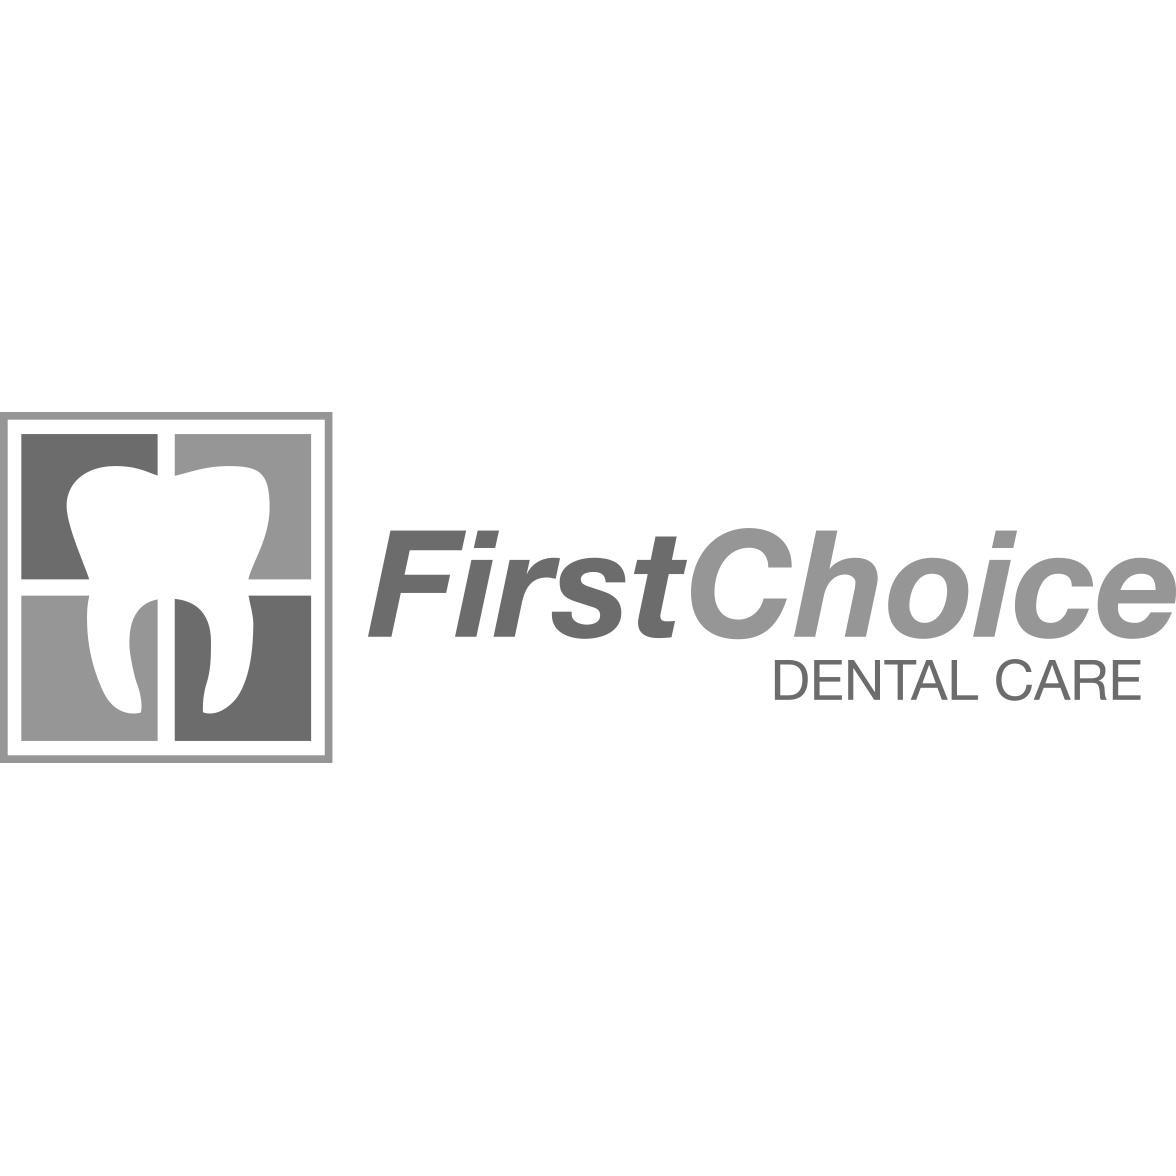 First Choice Dental Care